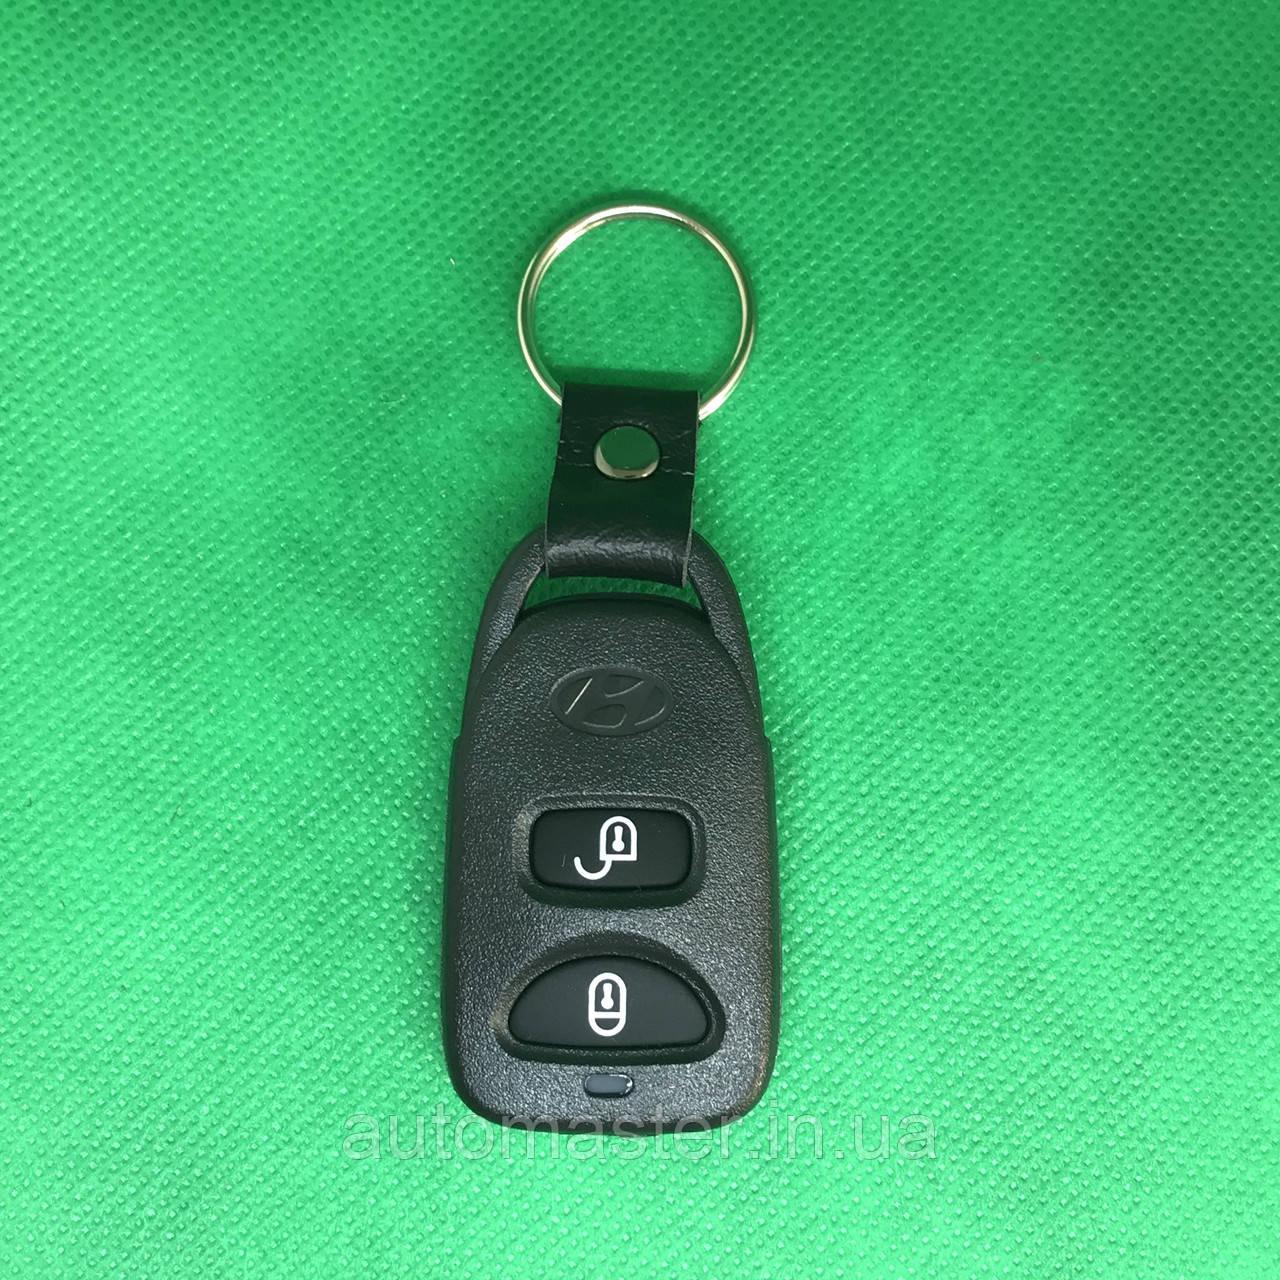 Корпус брелка Hyundai Tucson, Accent, Santa Fe, ix 35, Elantra (Хундай ) 2 кнопки